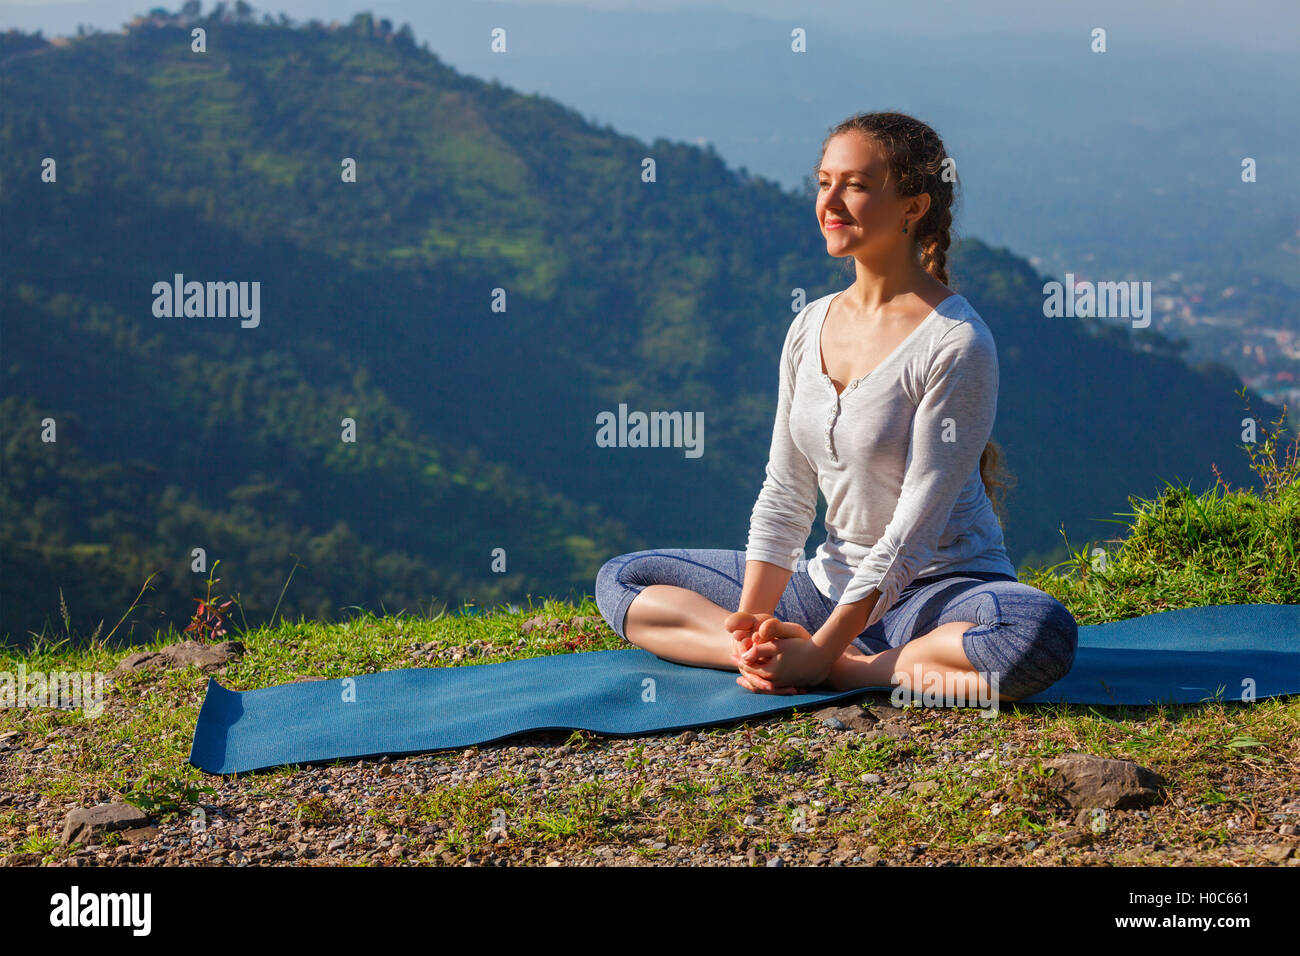 Sporty fit woman practices yoga asana Baddha Konasana outdoors - Stock Image